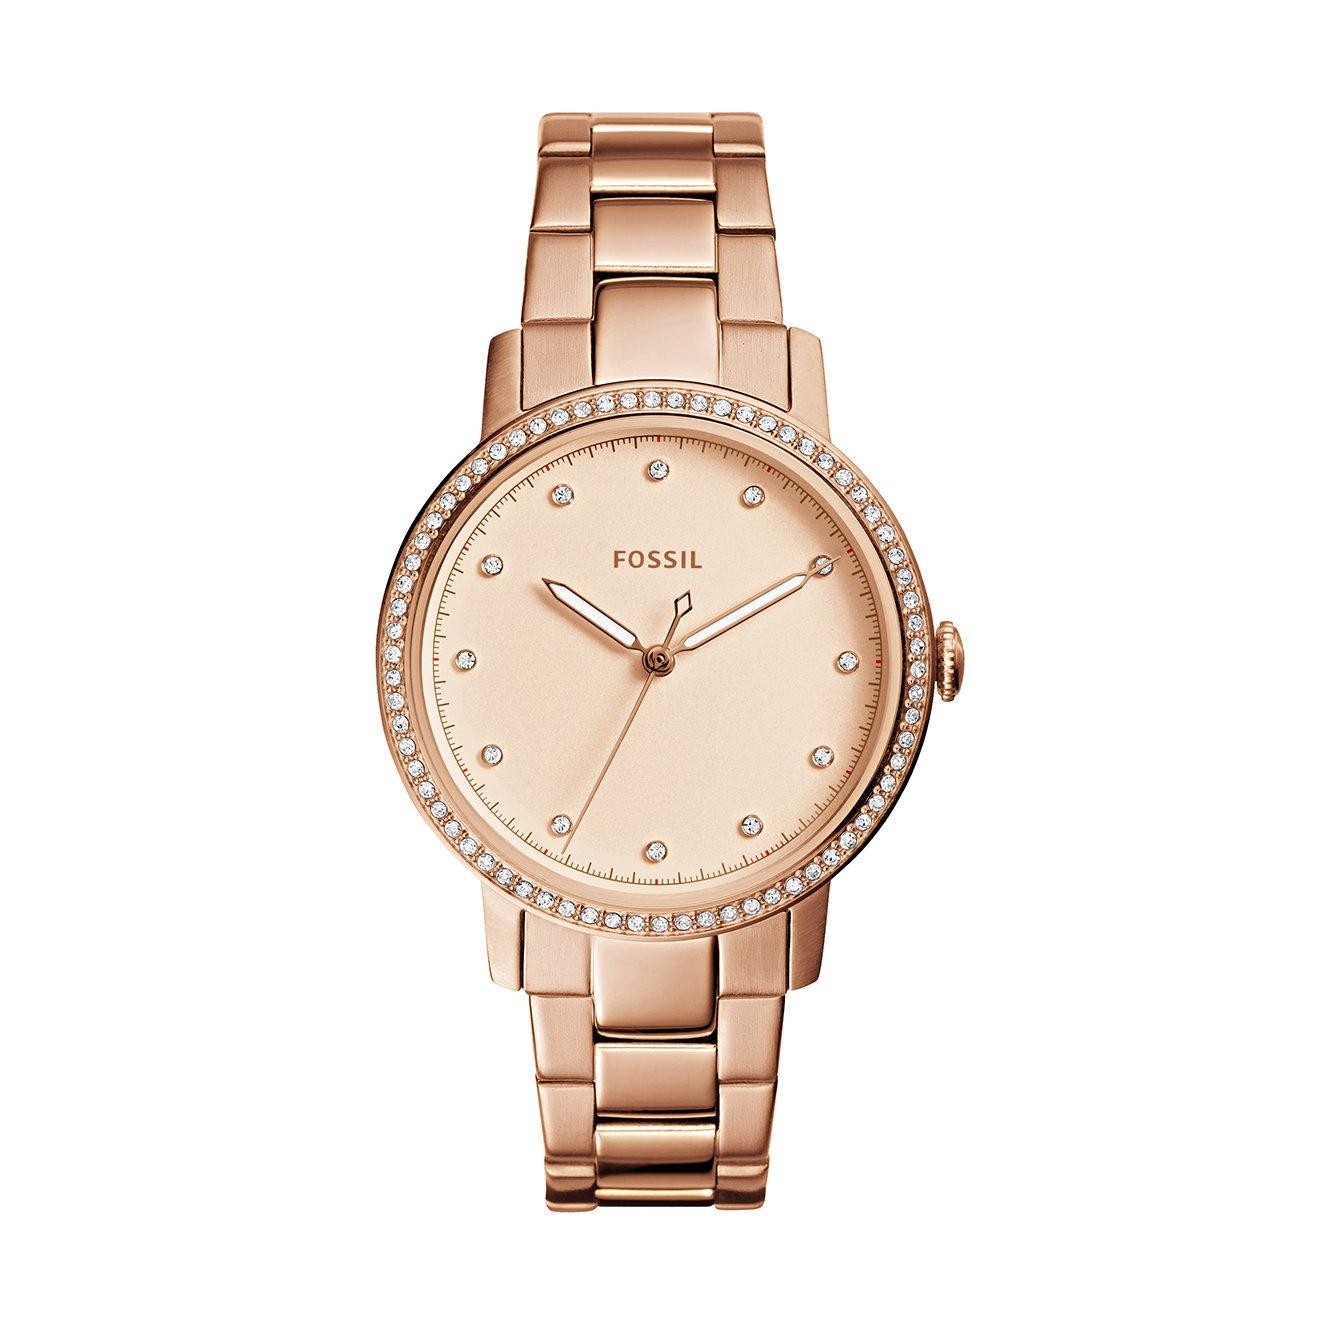 [Berlin/Brandenburg] Fossil Damen-Armbanduhr ES4288